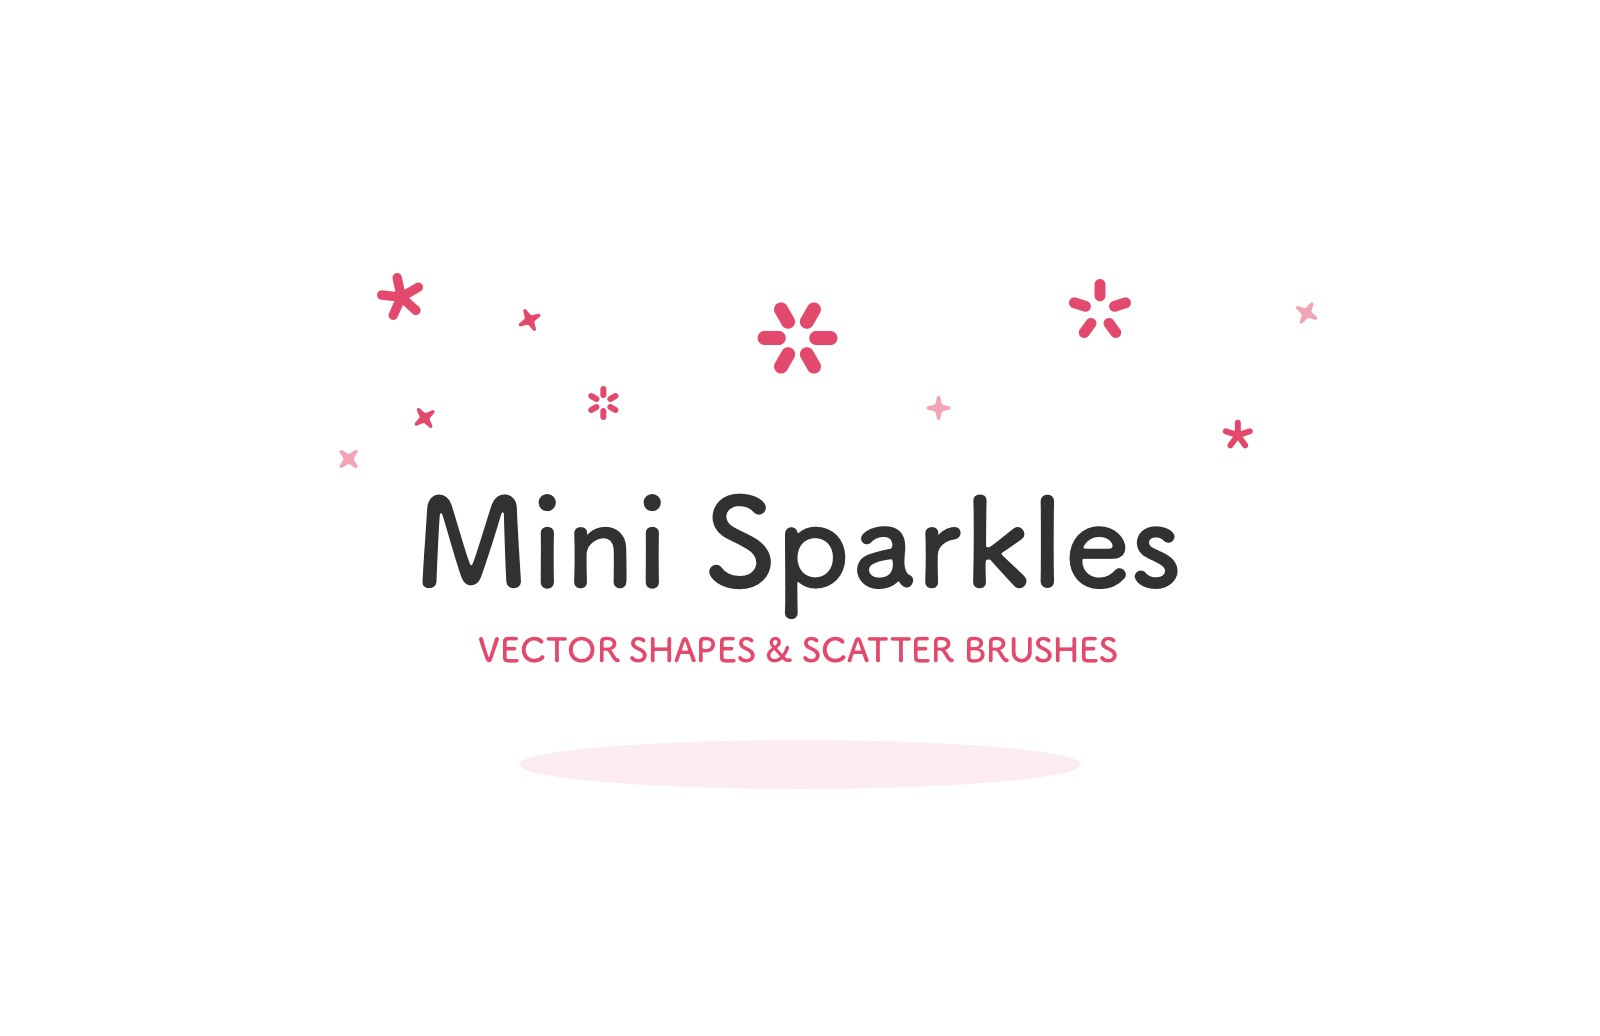 Mini Sparkles - Vector Shapes & Scatter Brushes